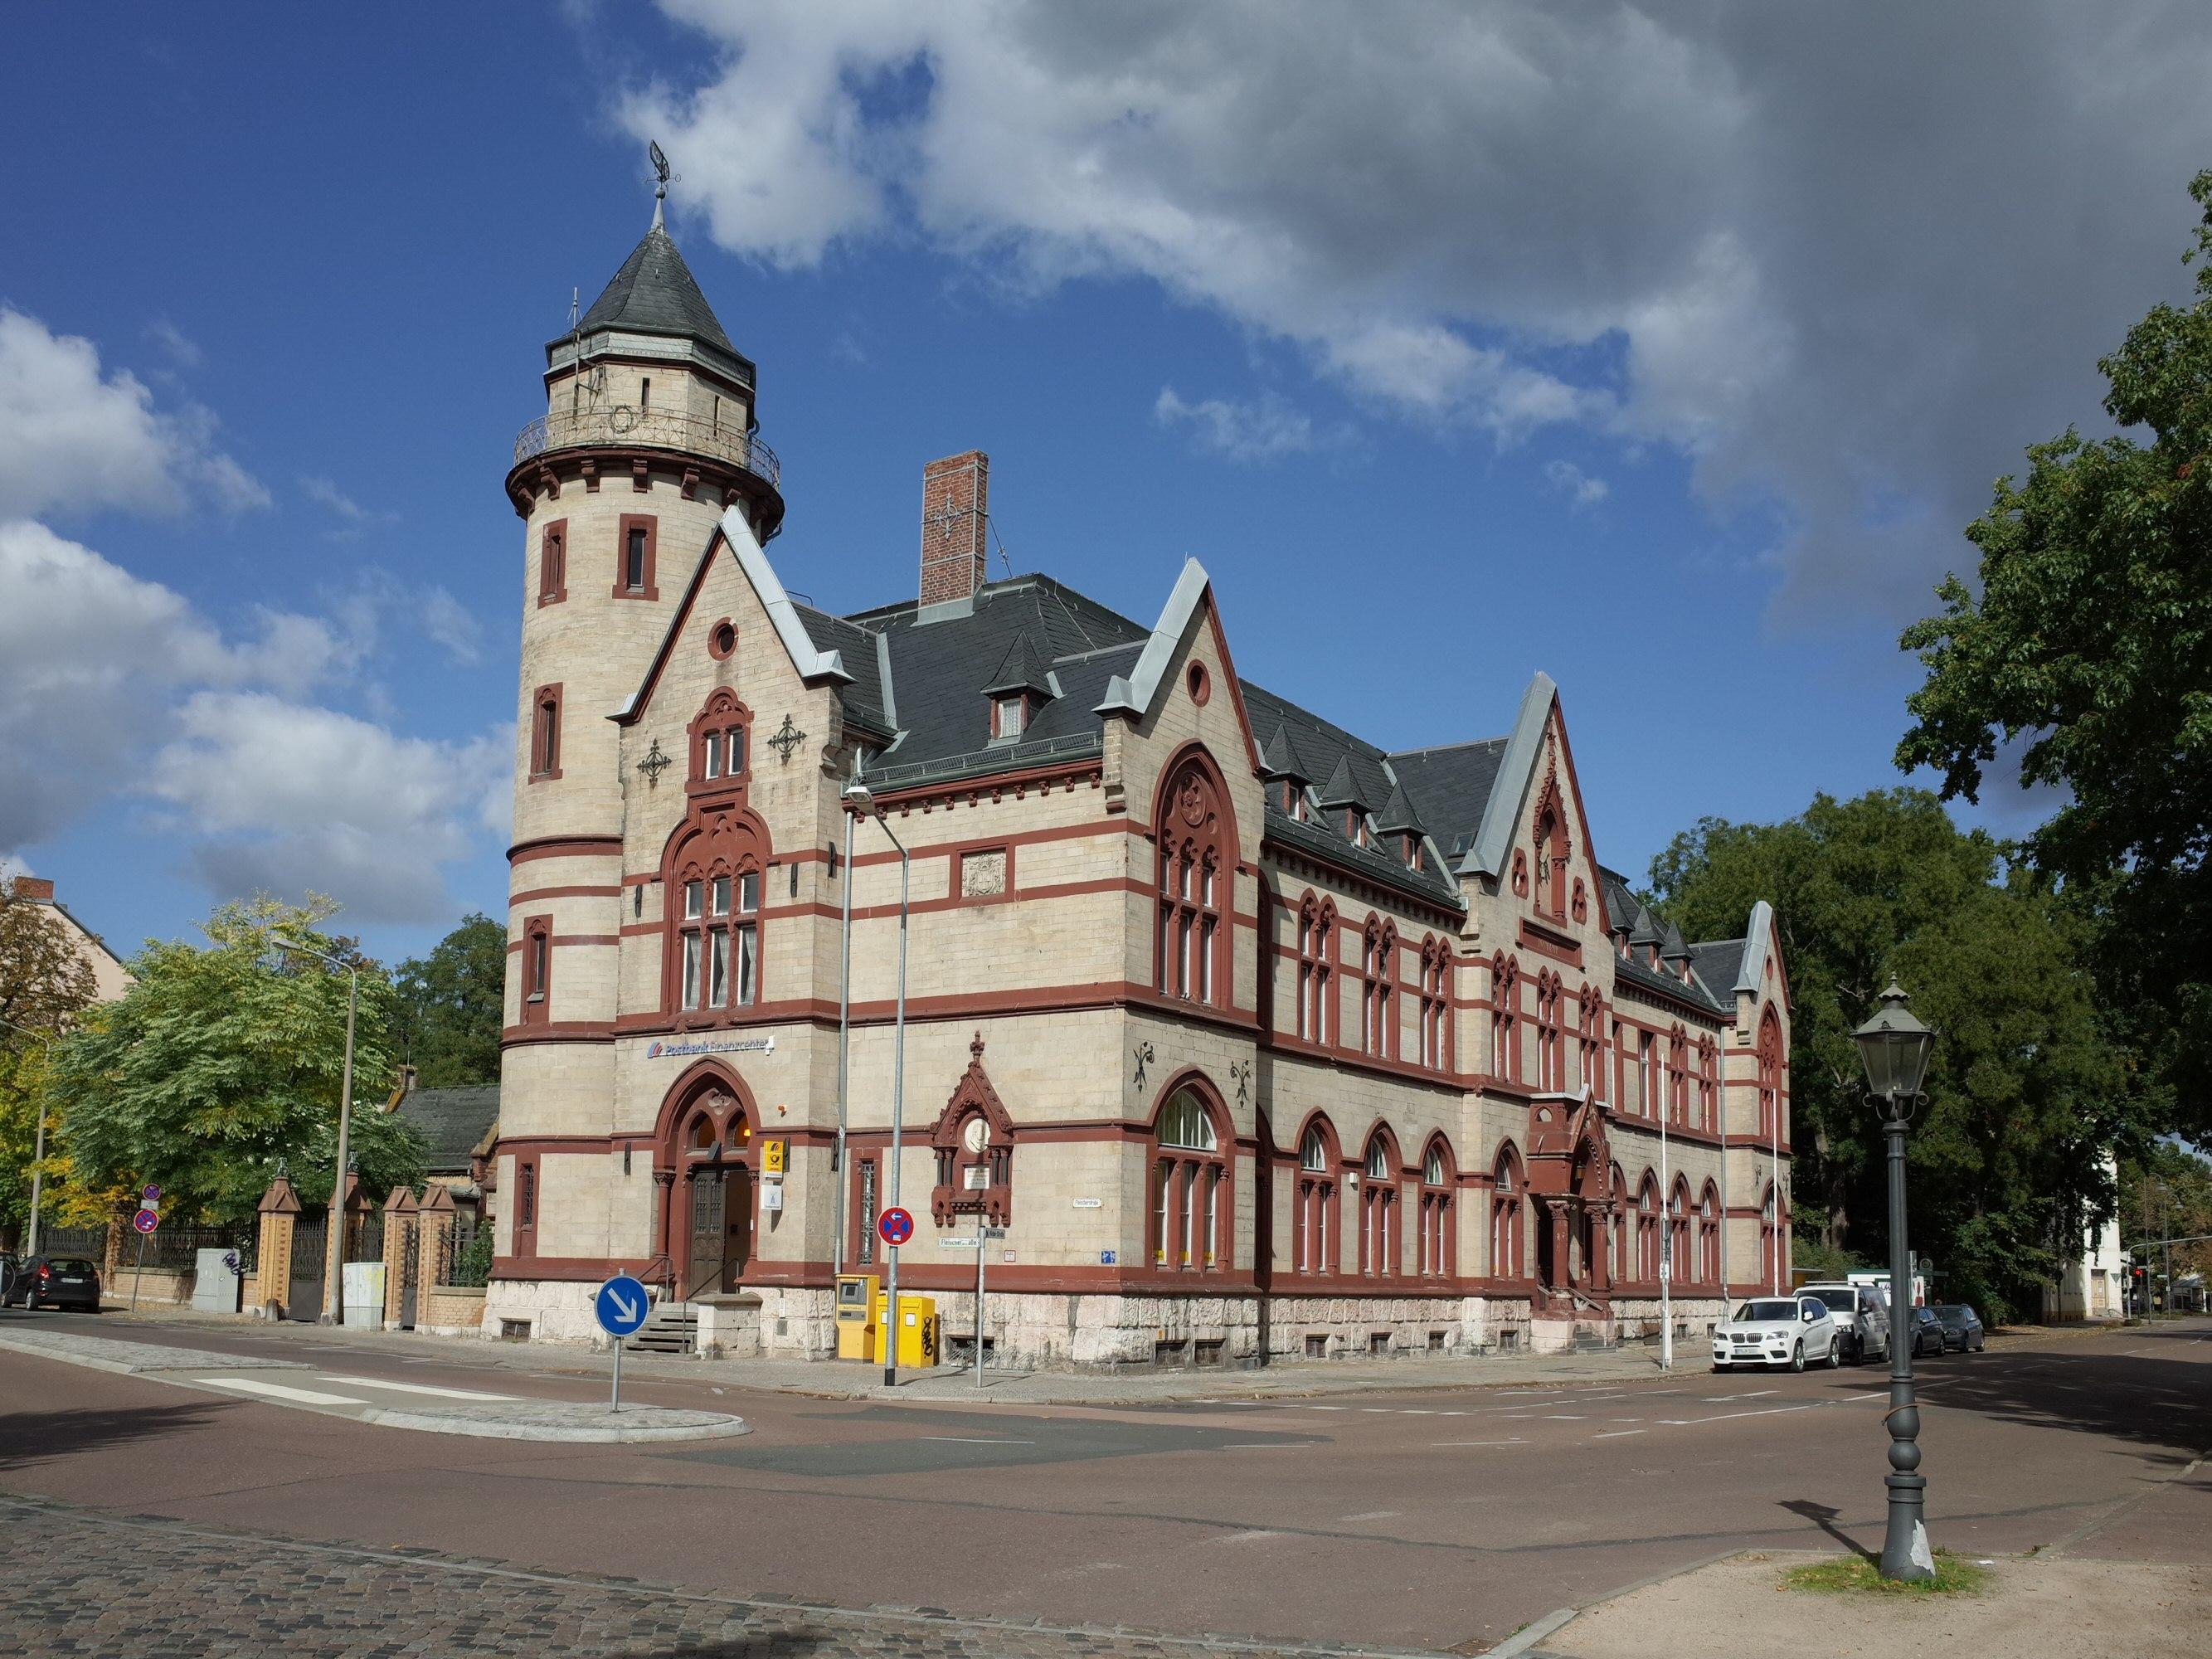 Partnersuche Lutherstadt Wittenberg — Singles in Lutherstadt Wittenberg - 9 Anzeigen